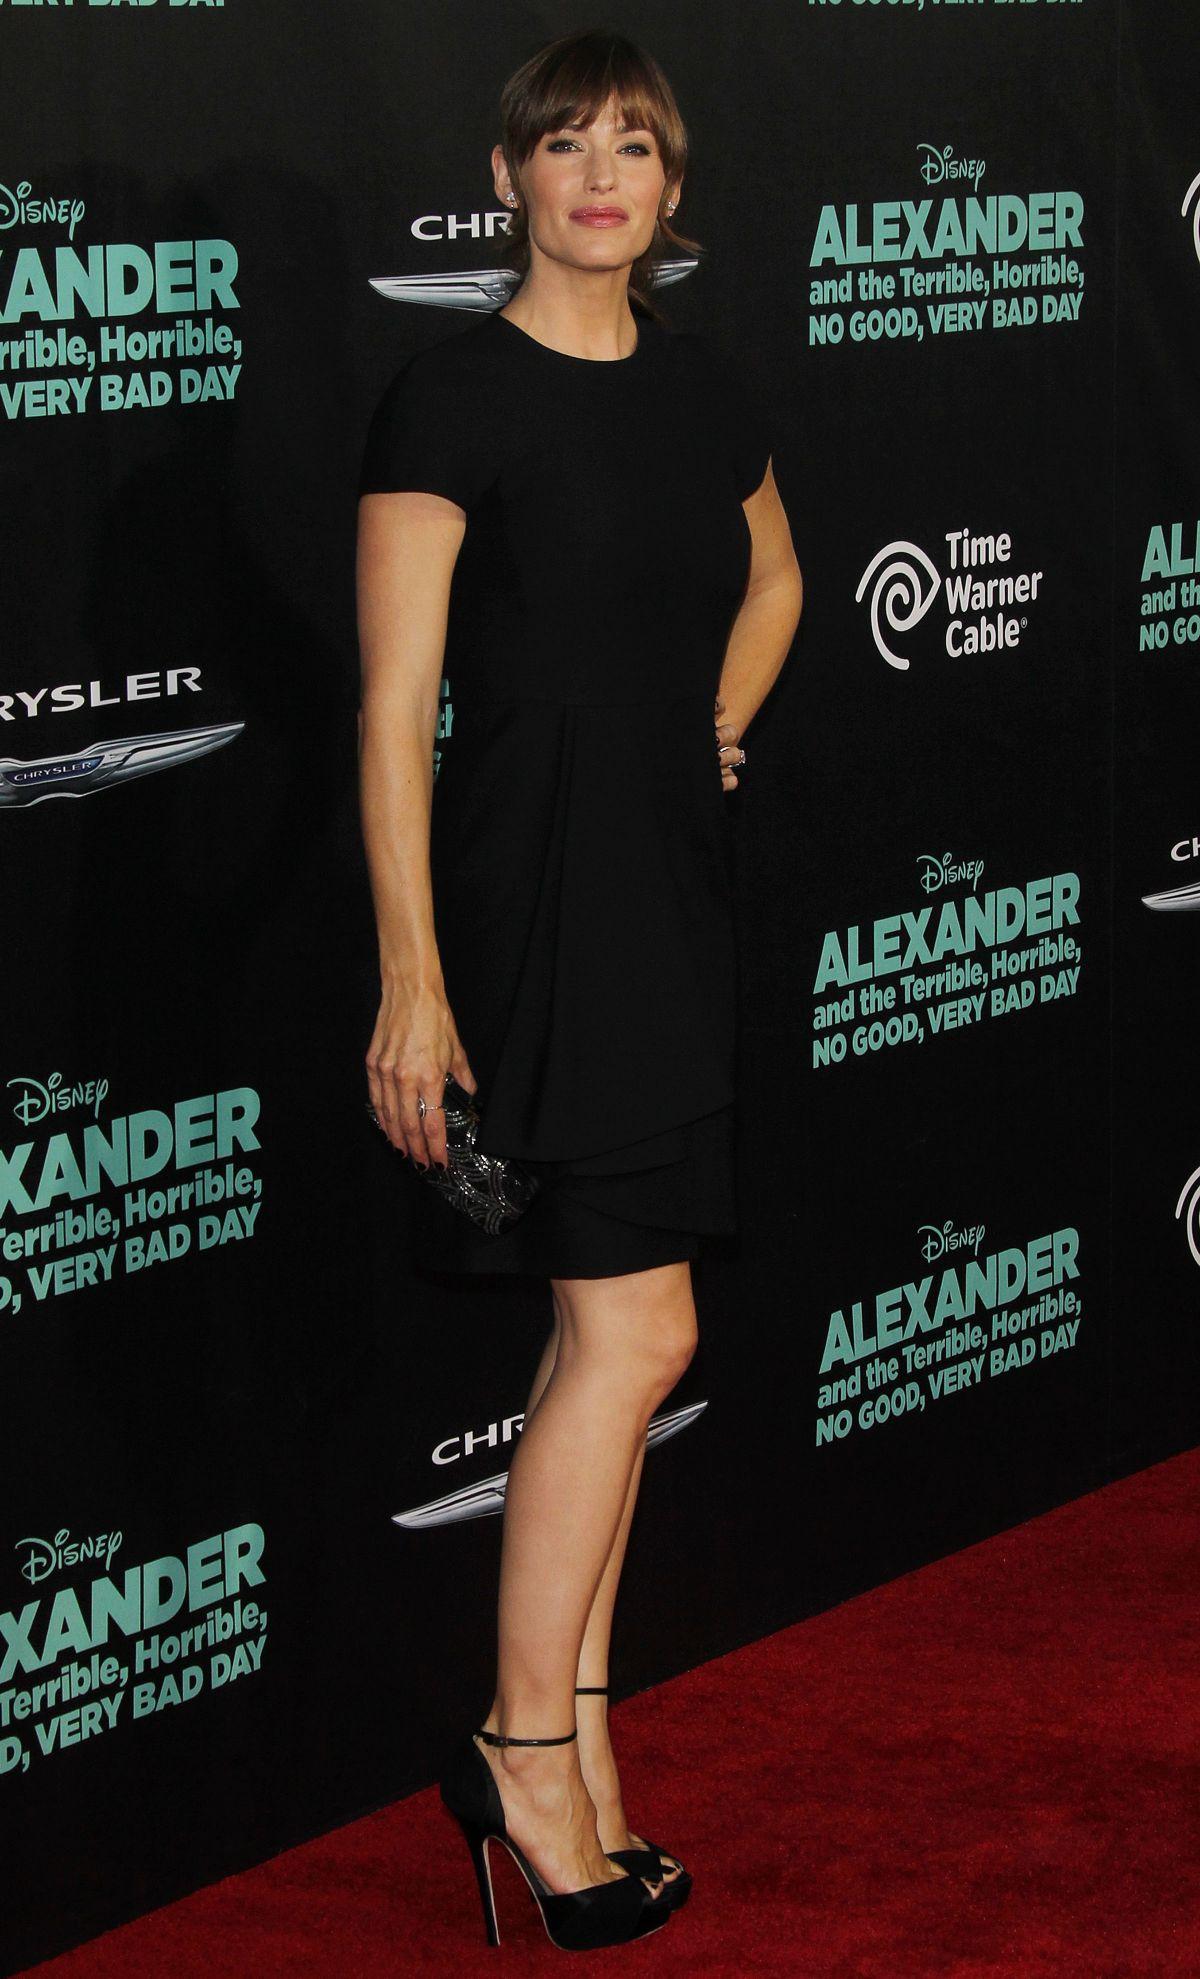 Jennifer Garner At Alexander And The Terrible Horrible